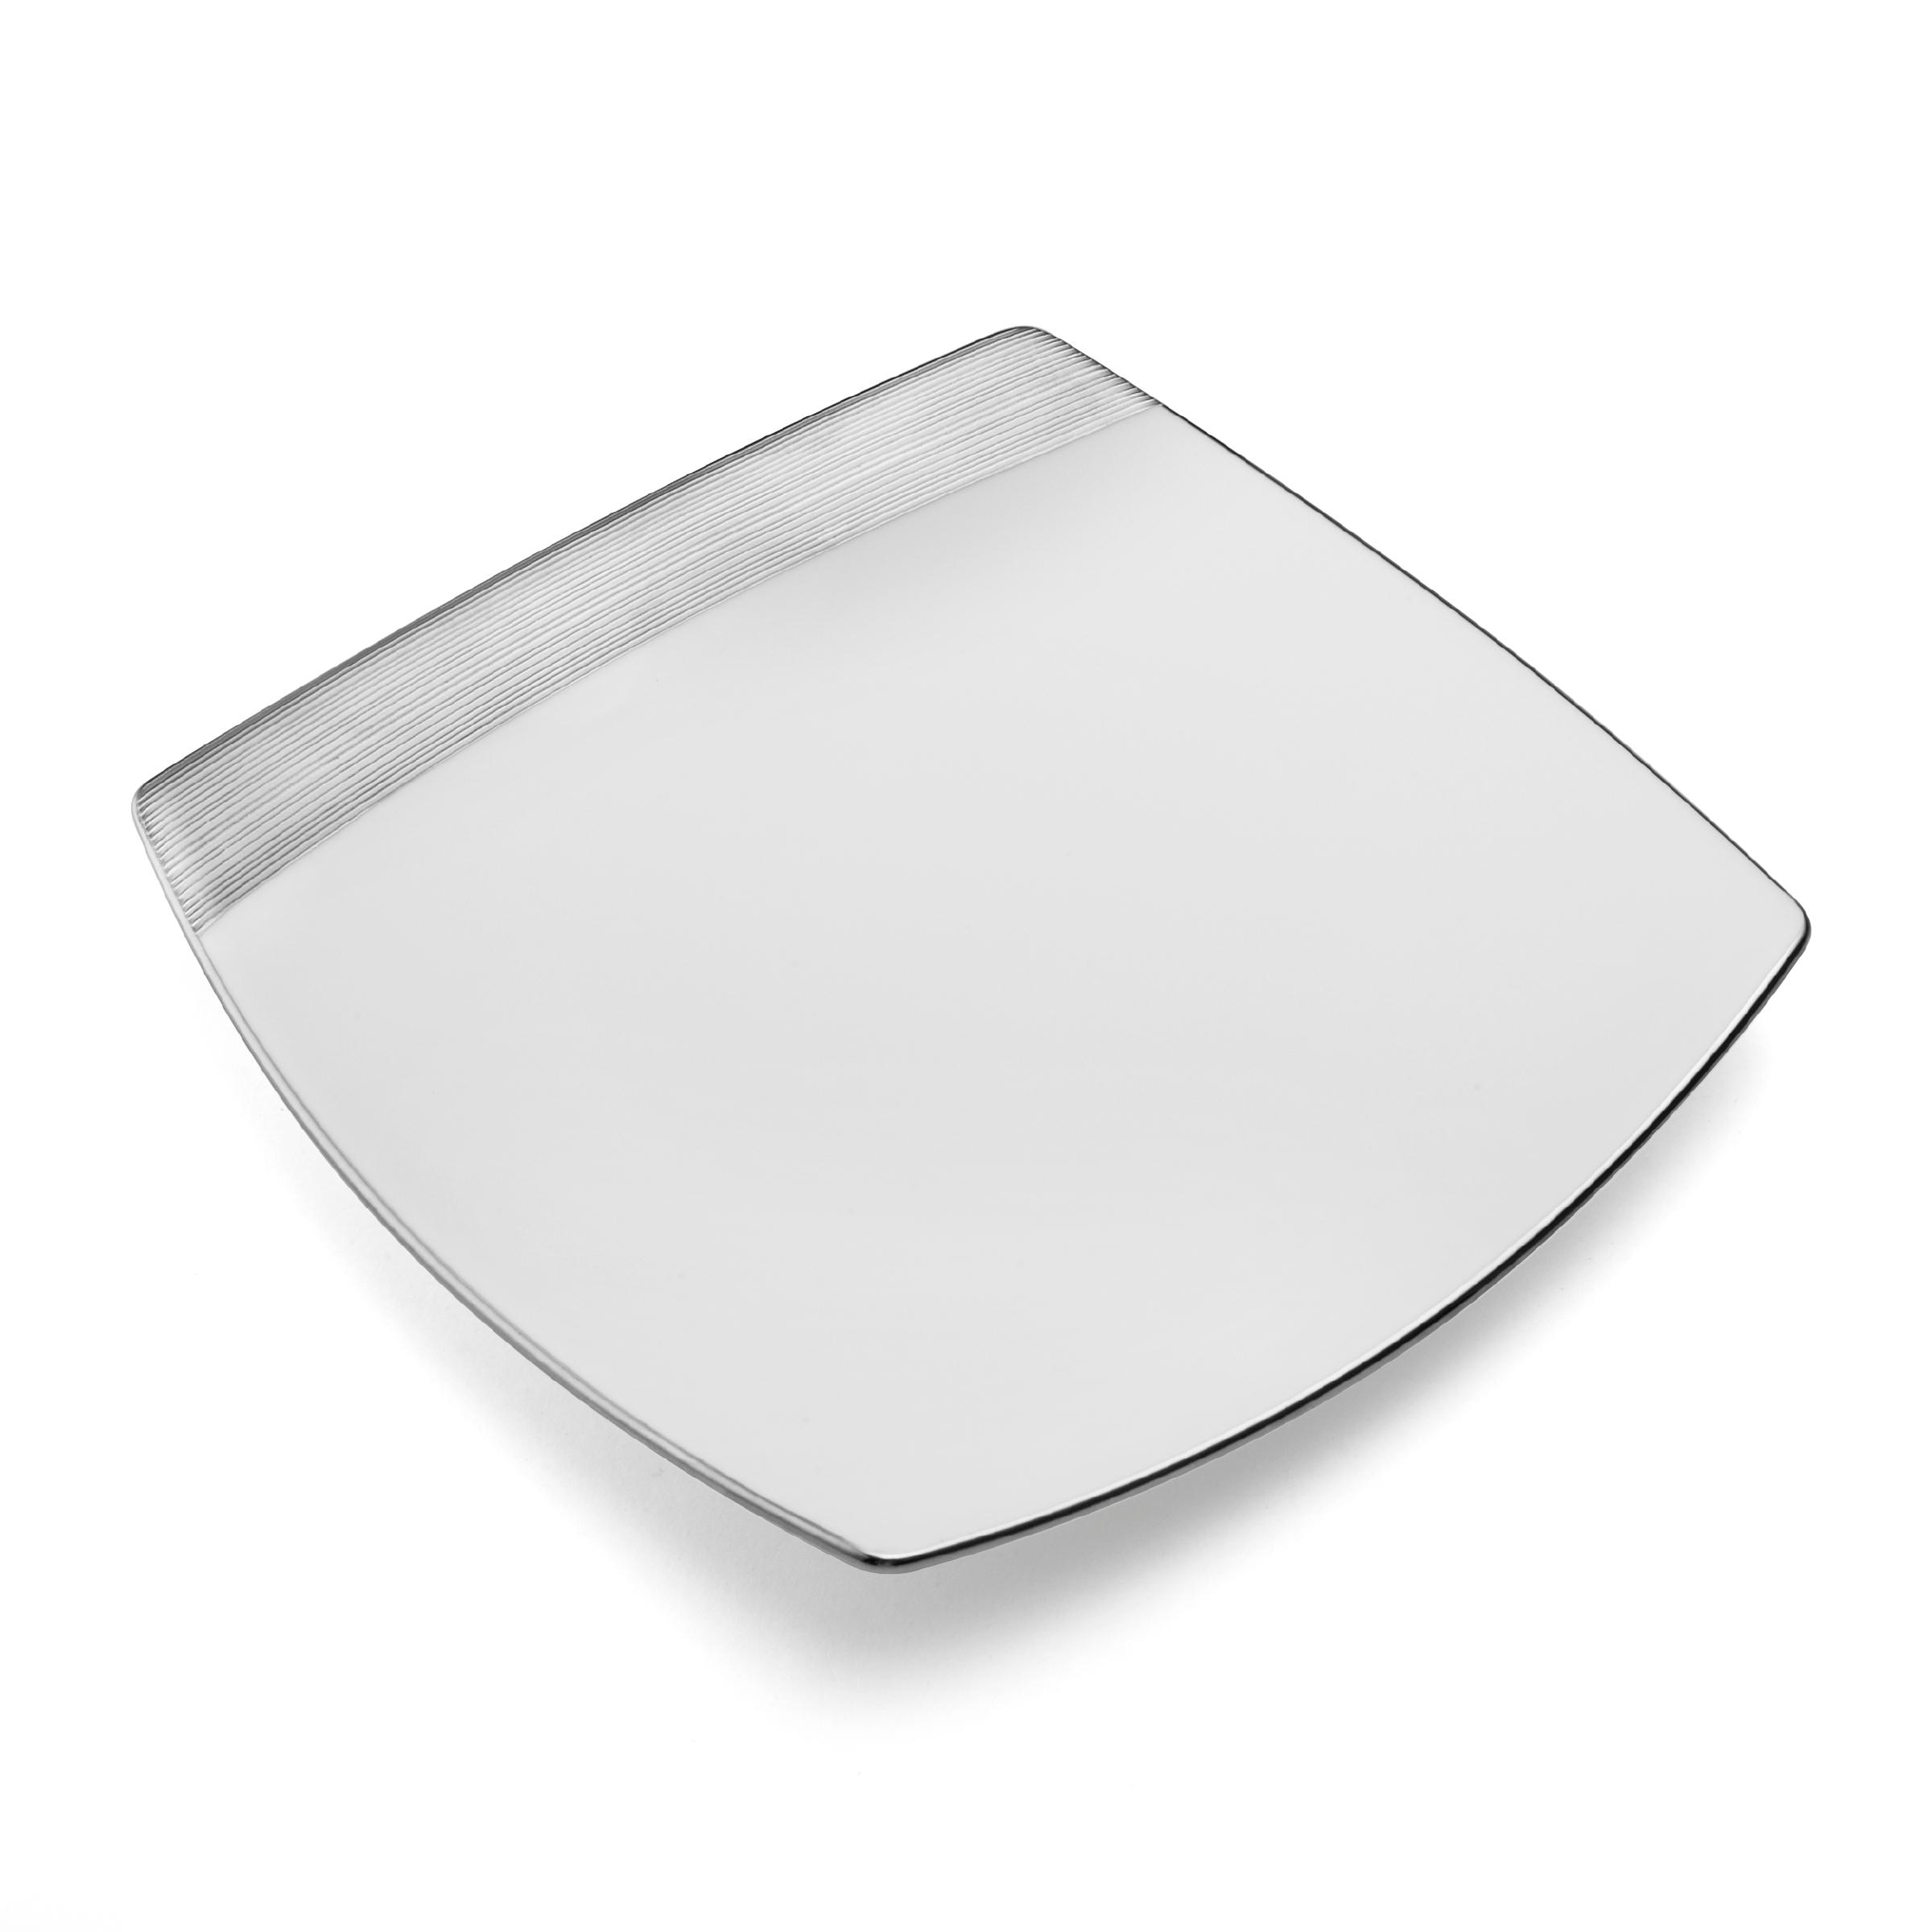 mikasa ridge square platinum dinner plate 10. Black Bedroom Furniture Sets. Home Design Ideas